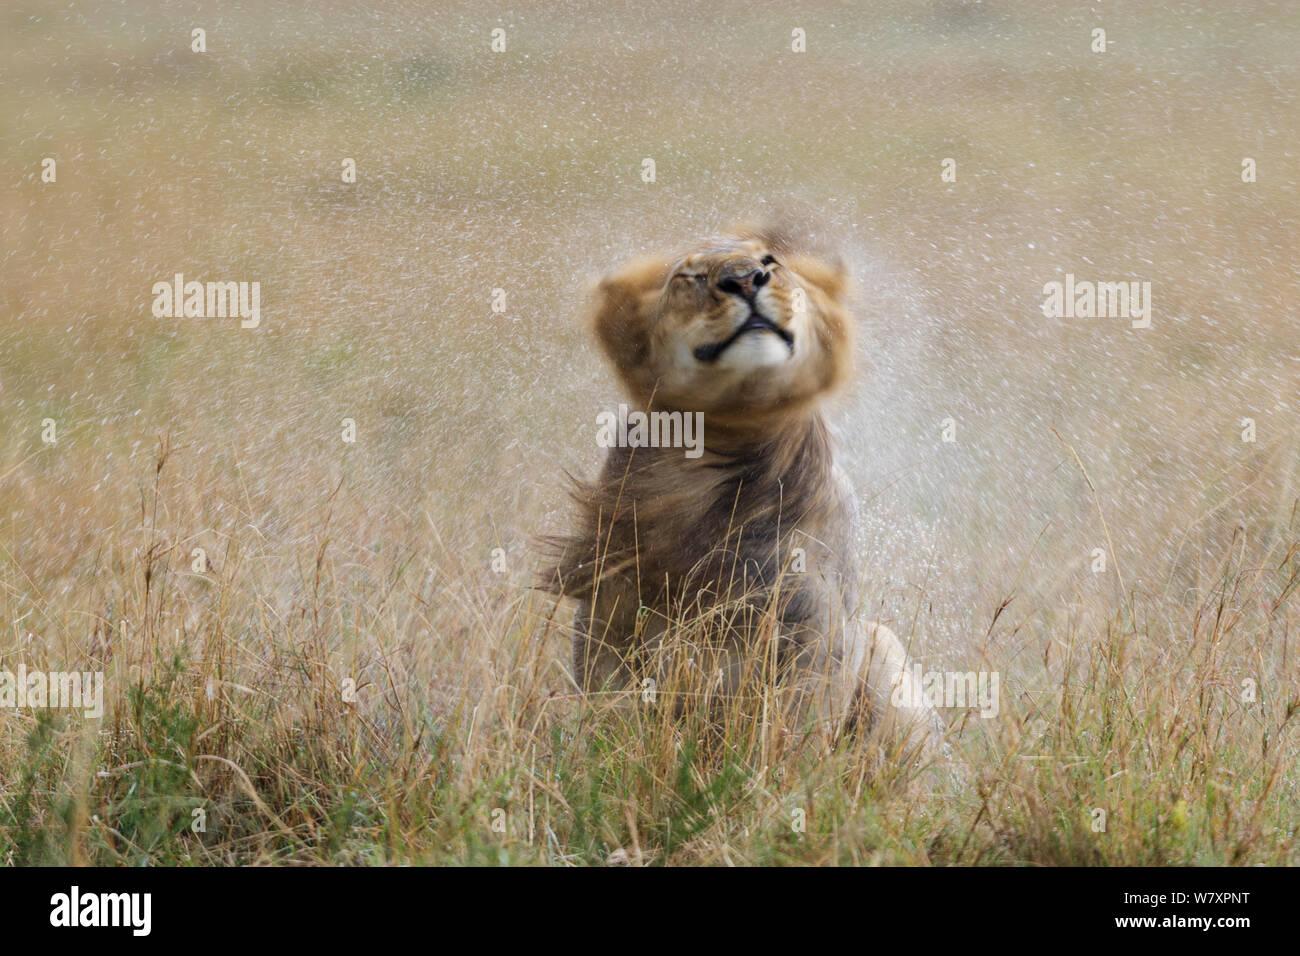 Lion (Panthera leo) male shaking water off after rain, Masai-Mara game reserve, Kenya. Stock Photo